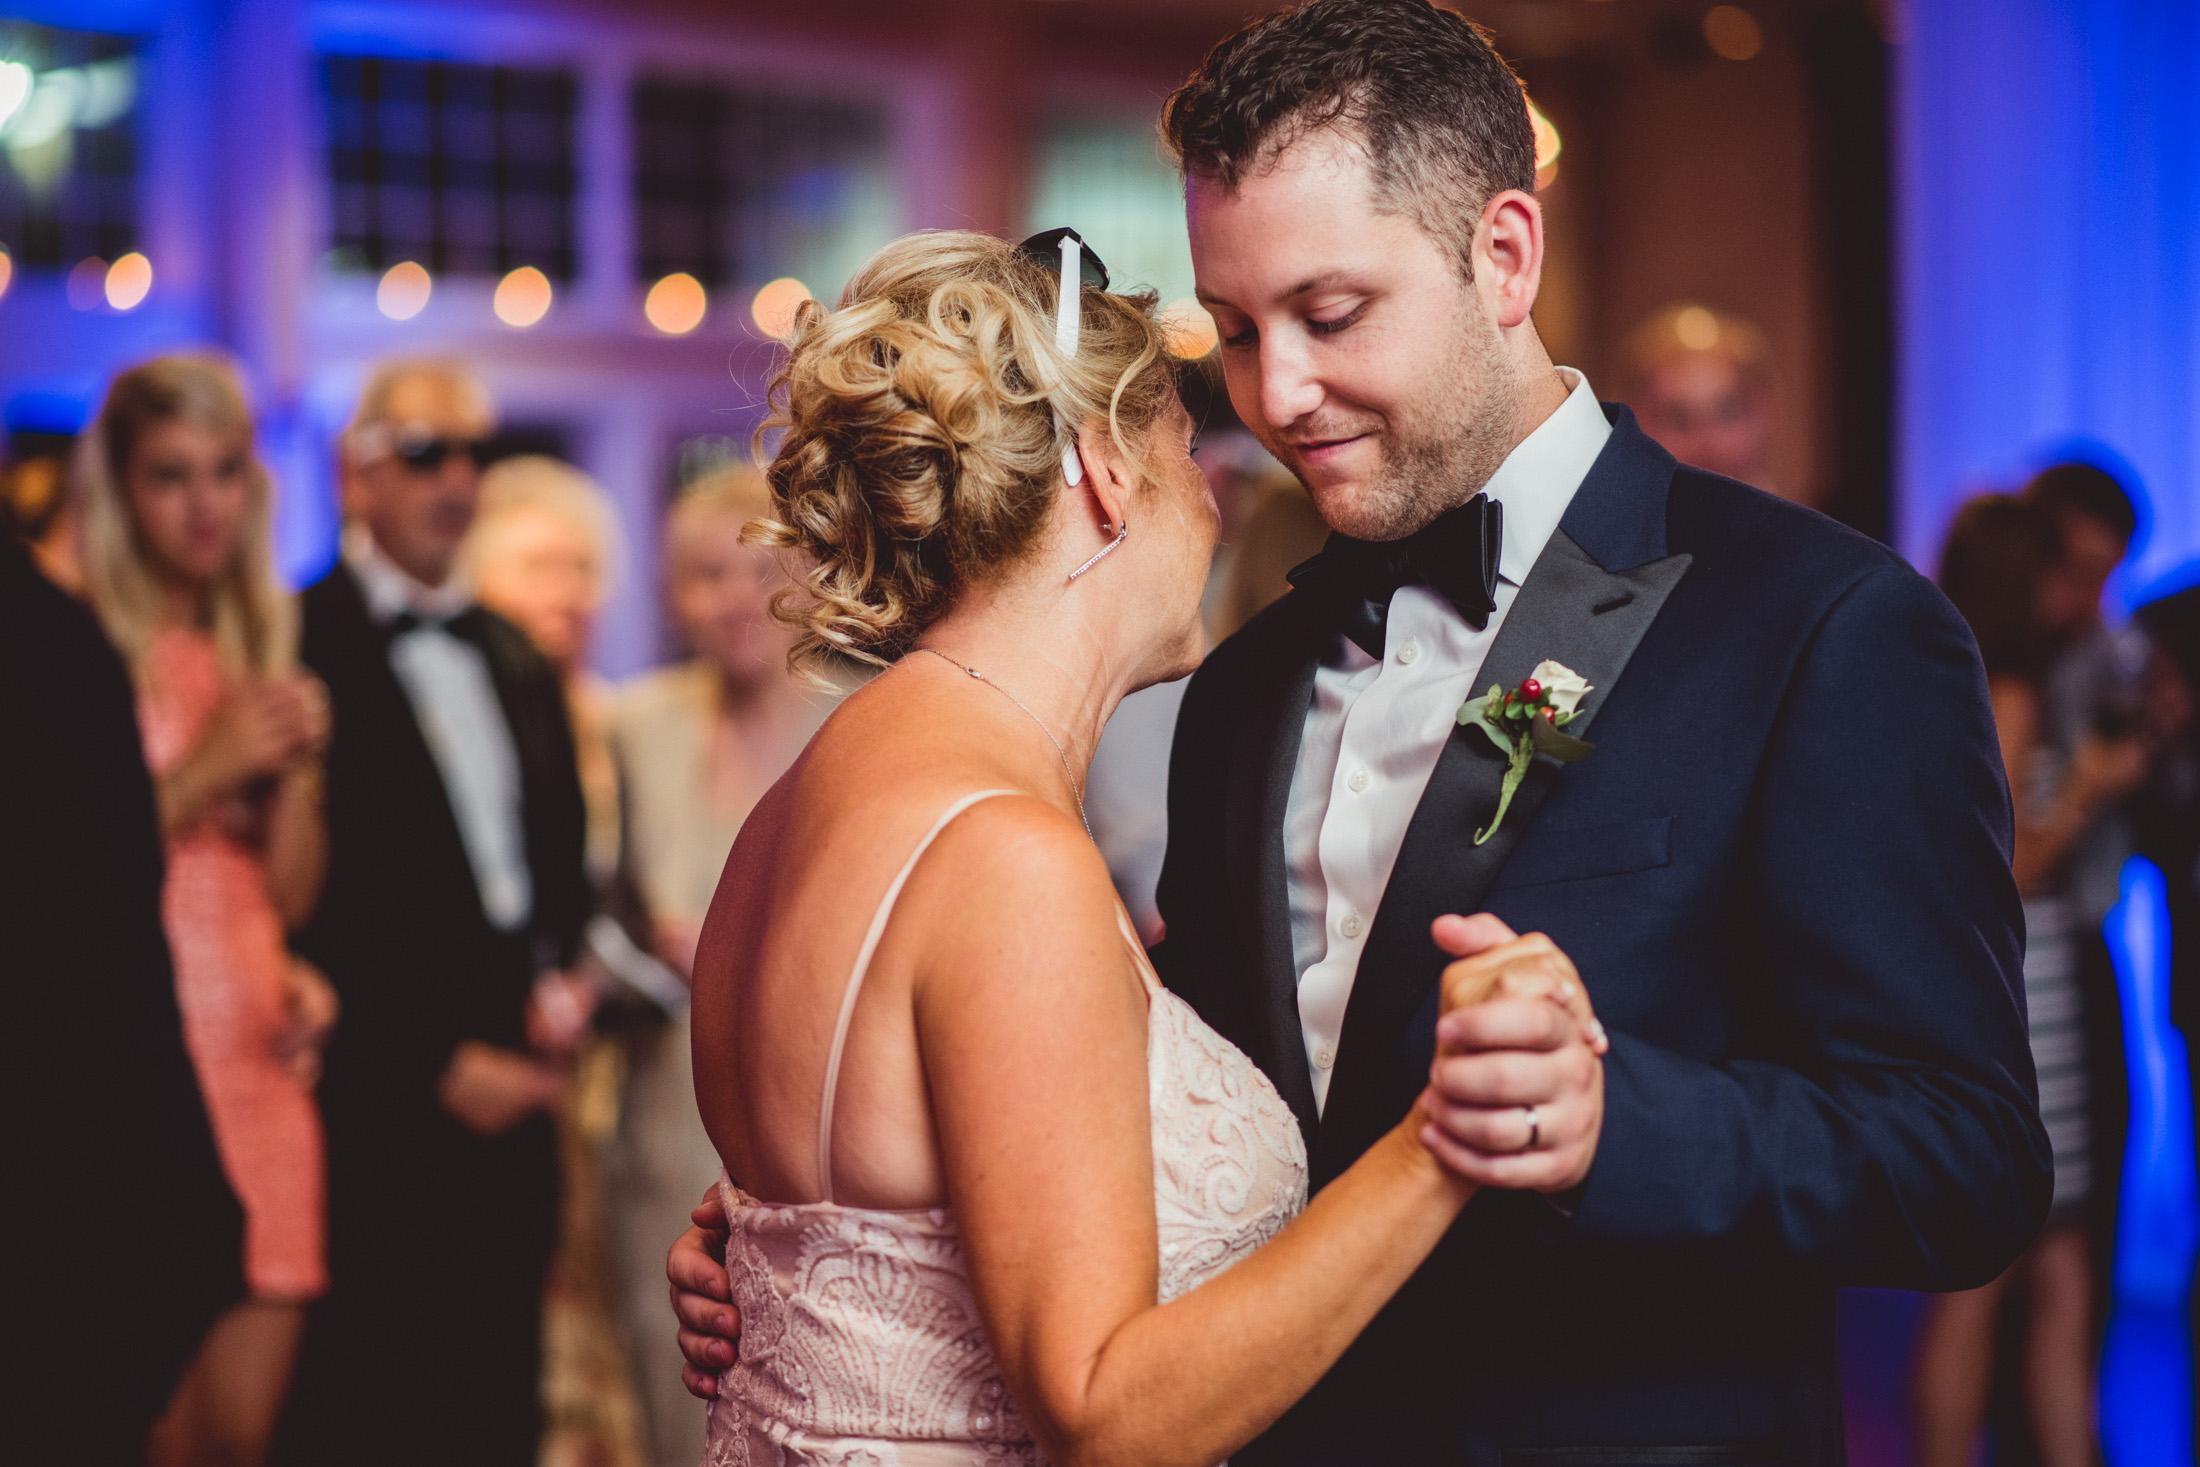 Cruiseport-Wedding-Photographer-46.jpg